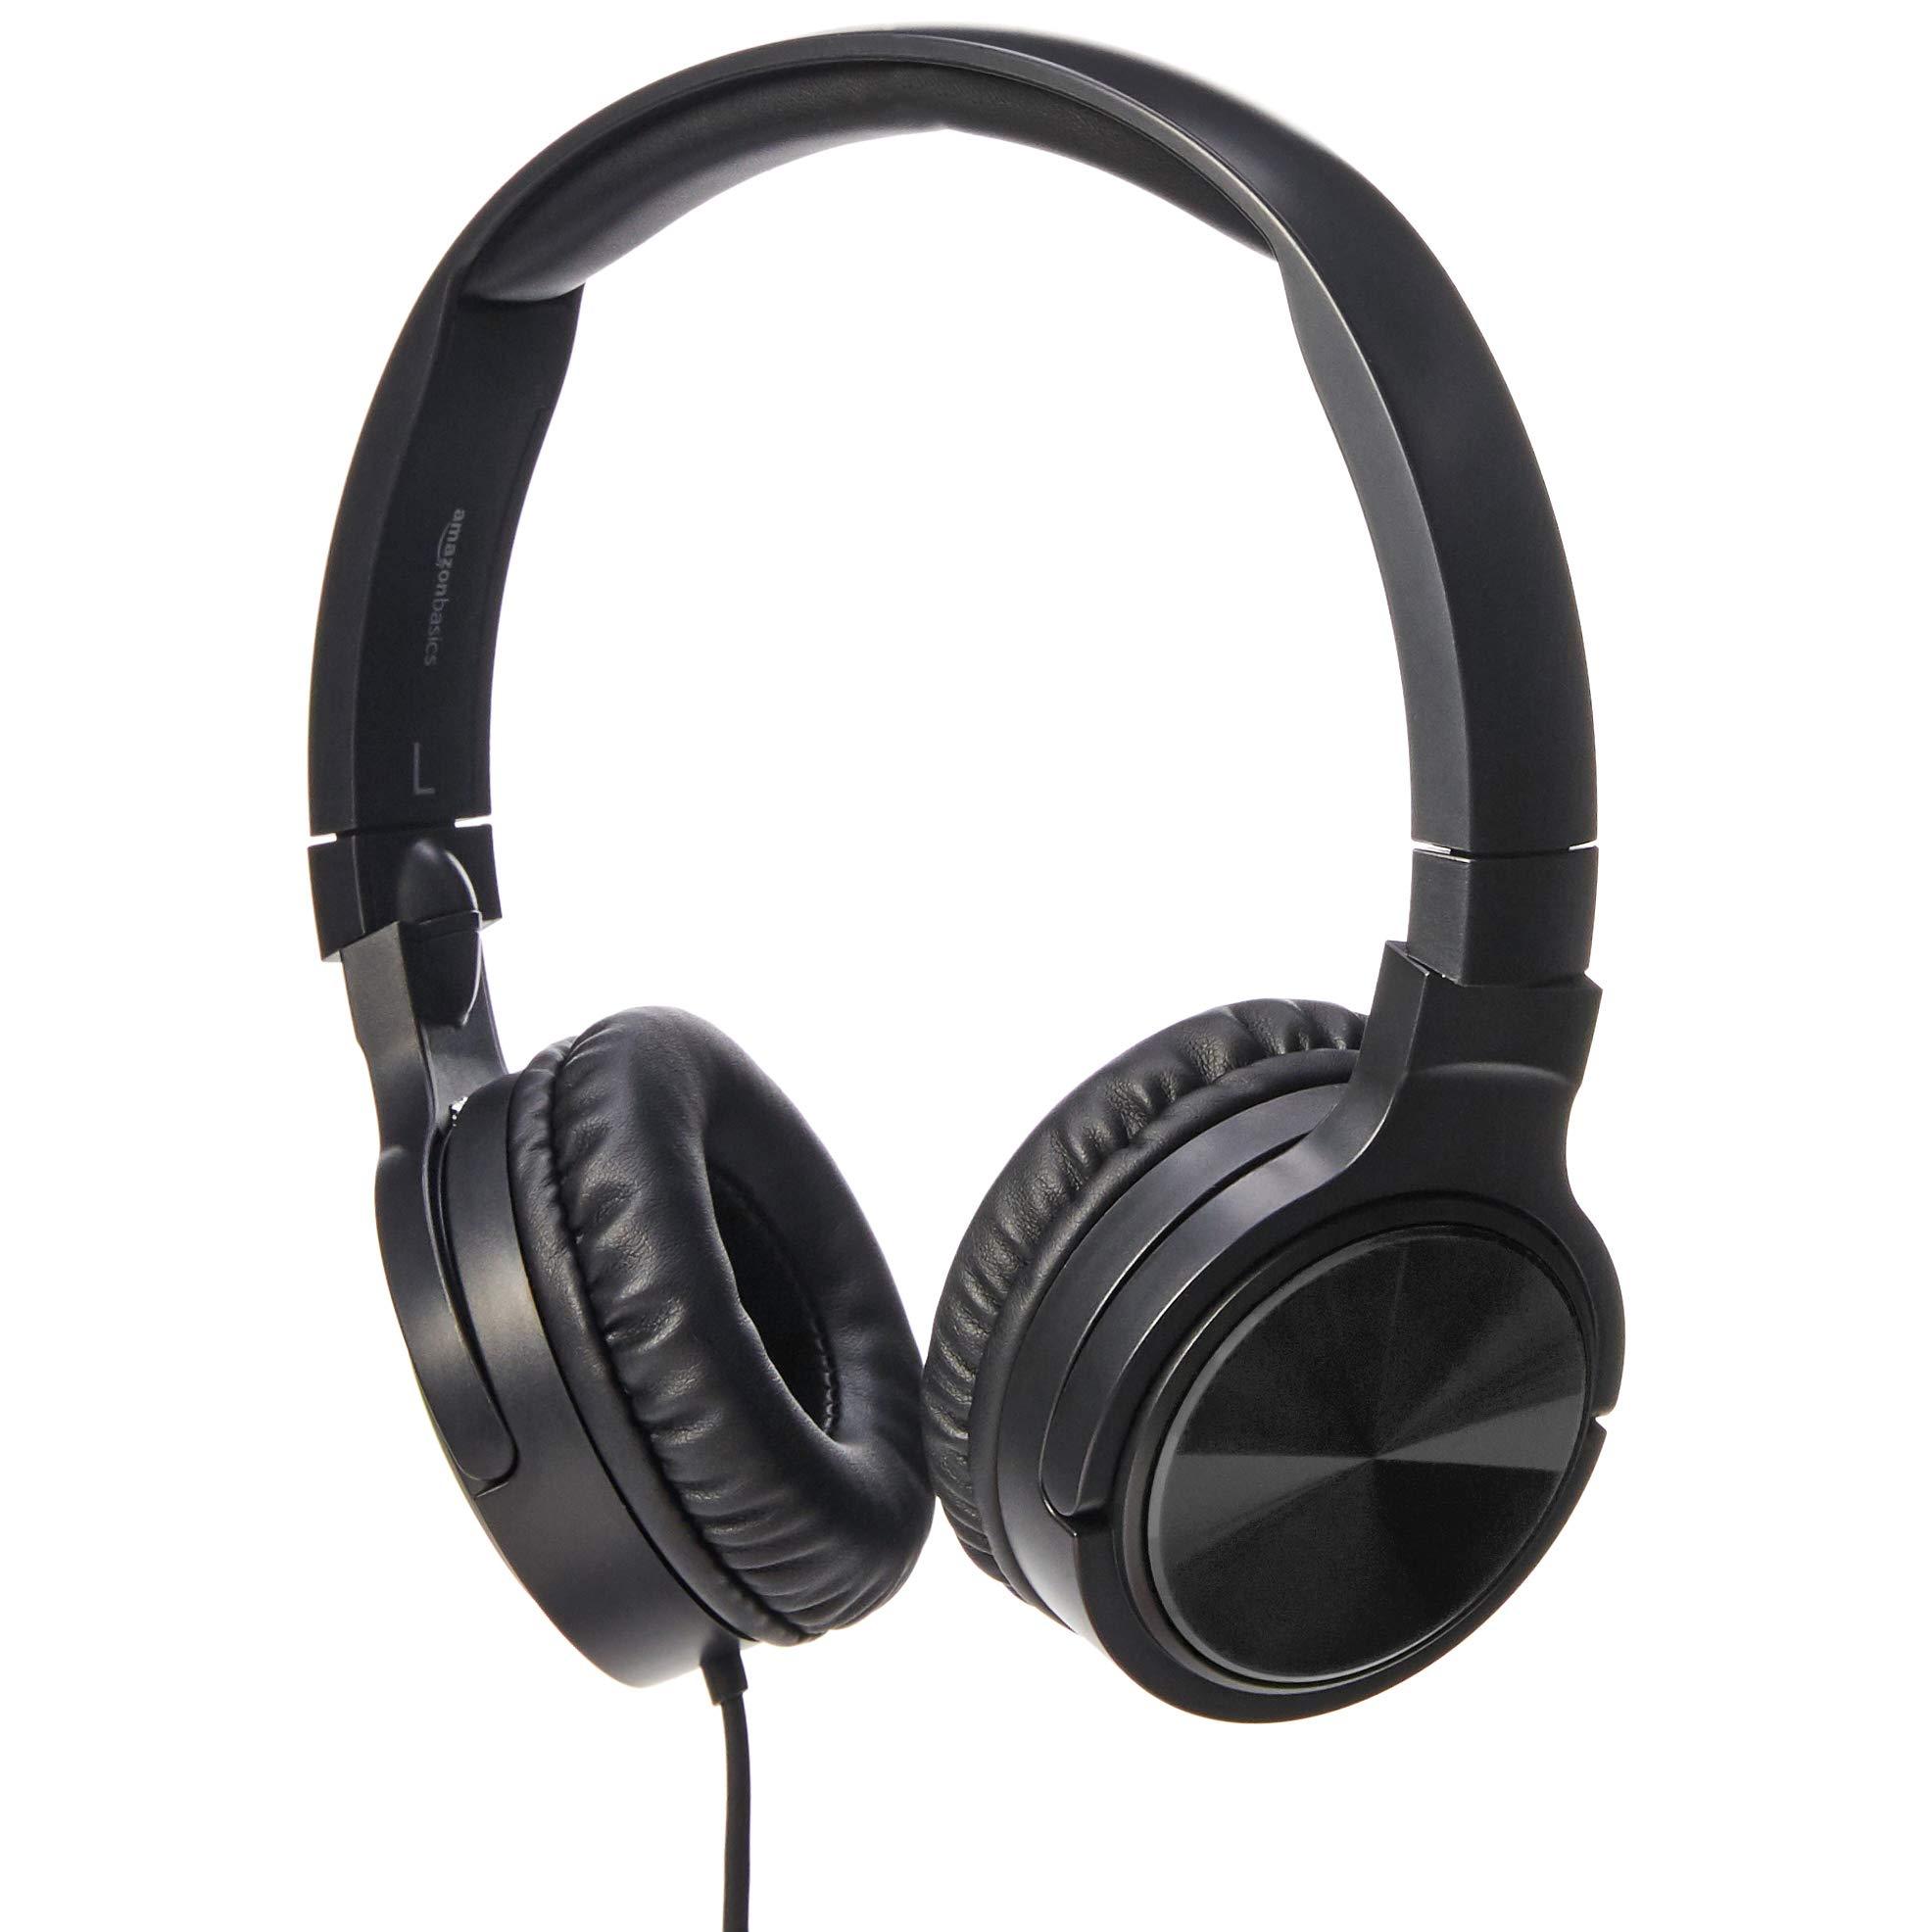 AmazonBasics Lightweight On-Ear Wired Headphones, Black